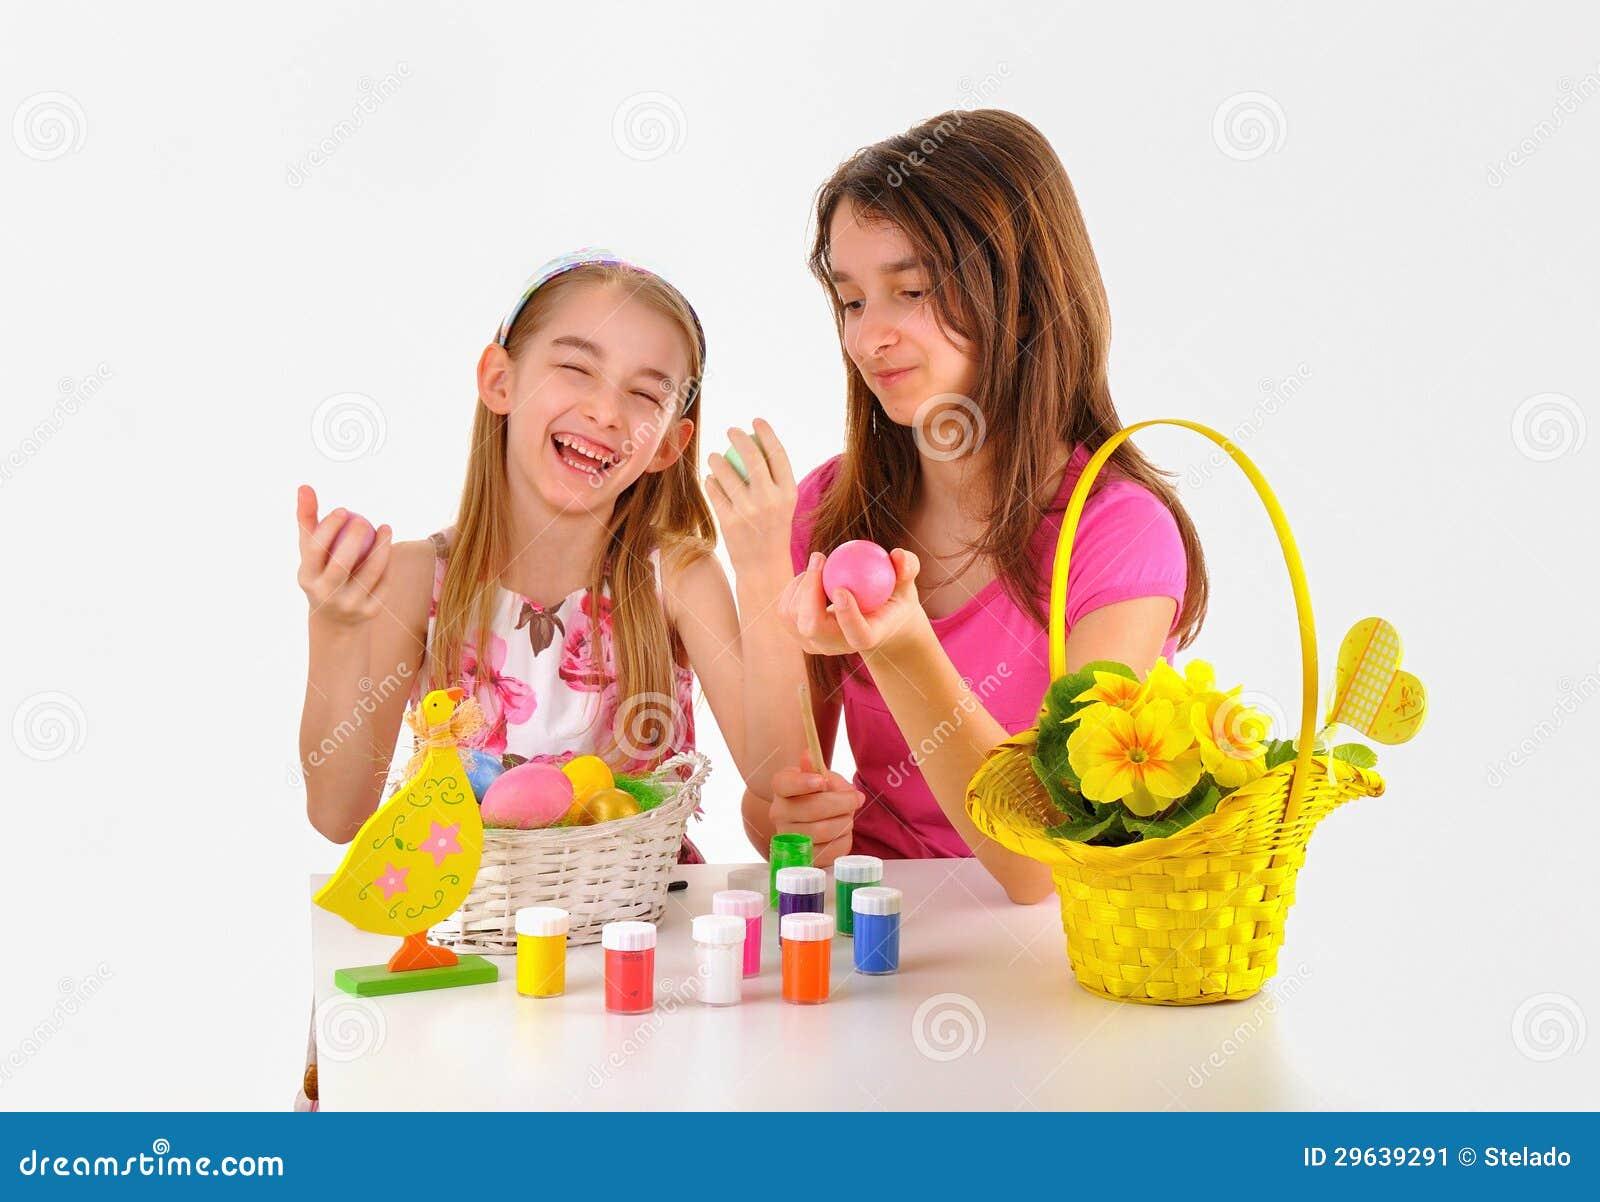 Pascua - Dos Muchachas, Cesta Con Los Huevos, Pintura Para Colorear ...